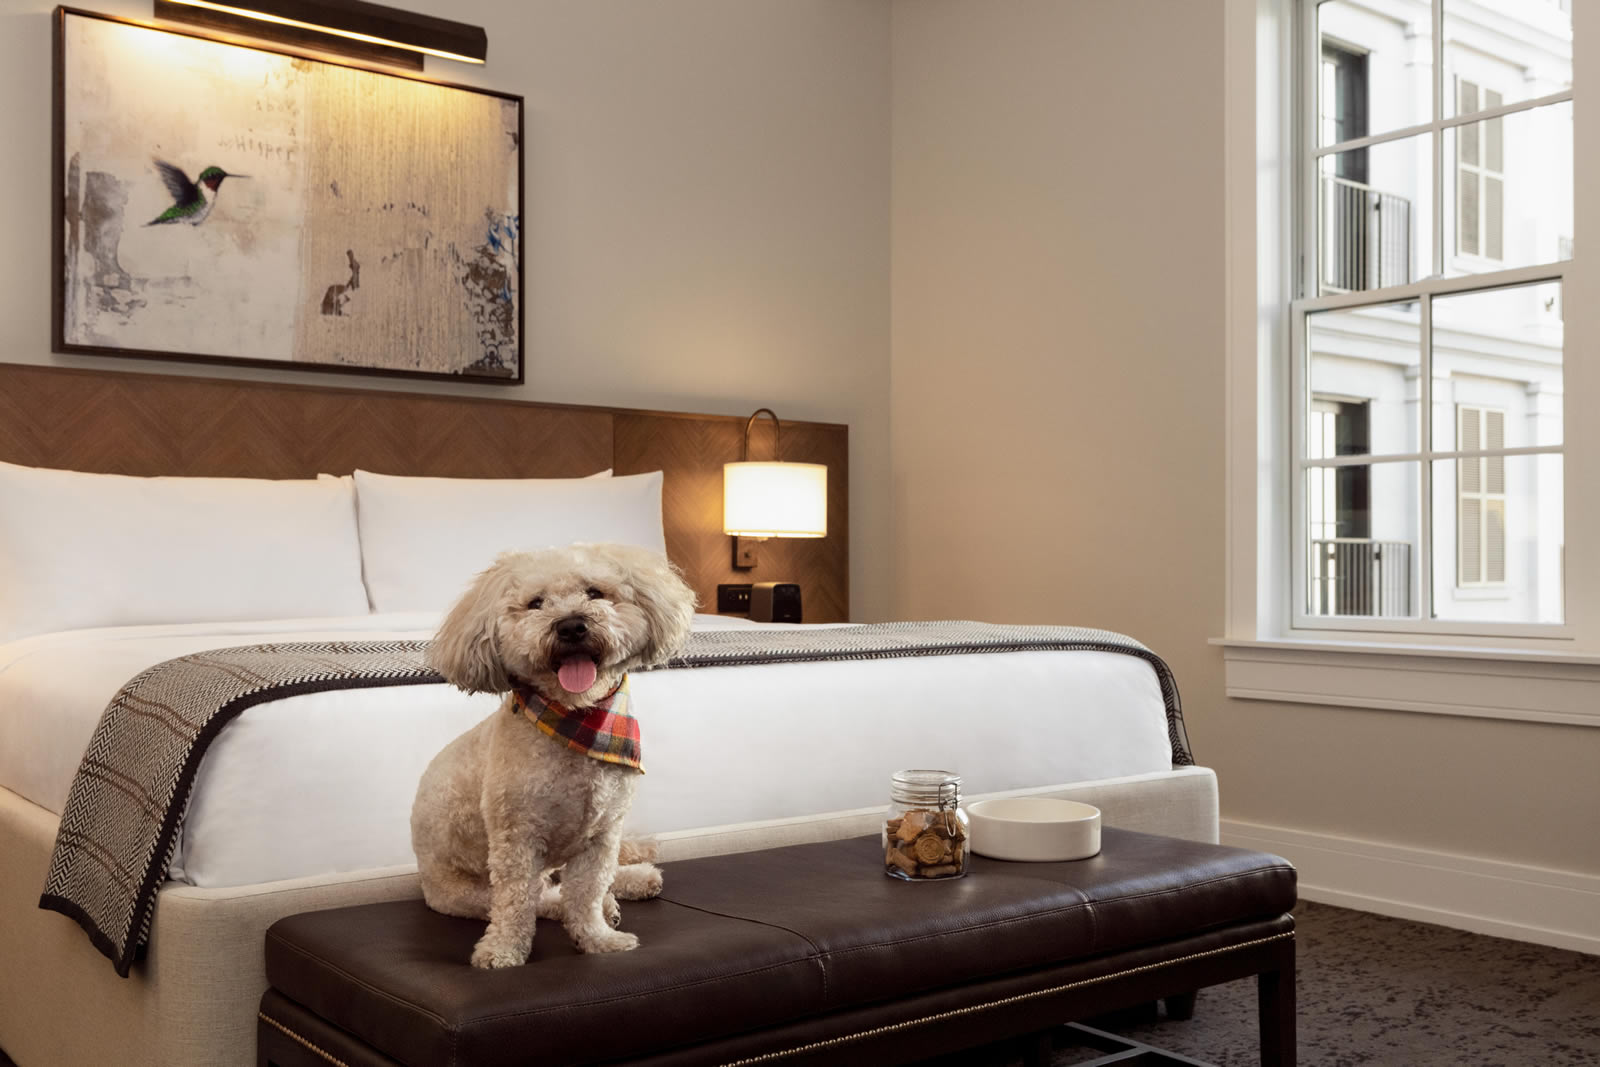 Pet-friendly room